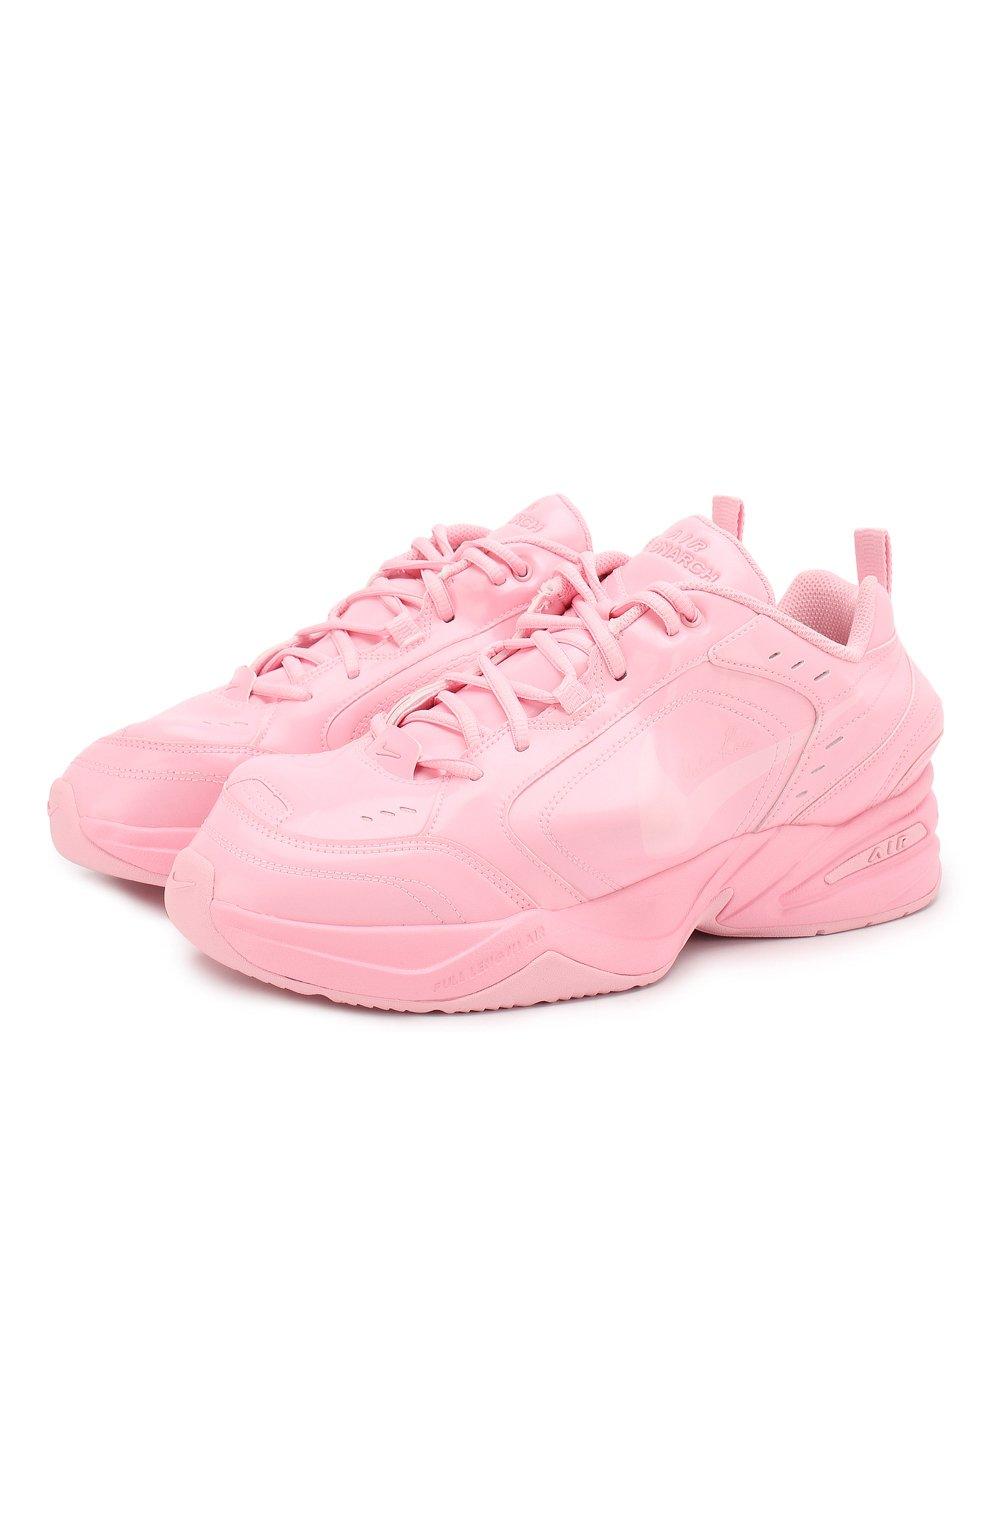 74b413400 Кожаные кроссовки NikeLab x Martine Rose Air Monarch IV NikeLab розовые |  Фото №1